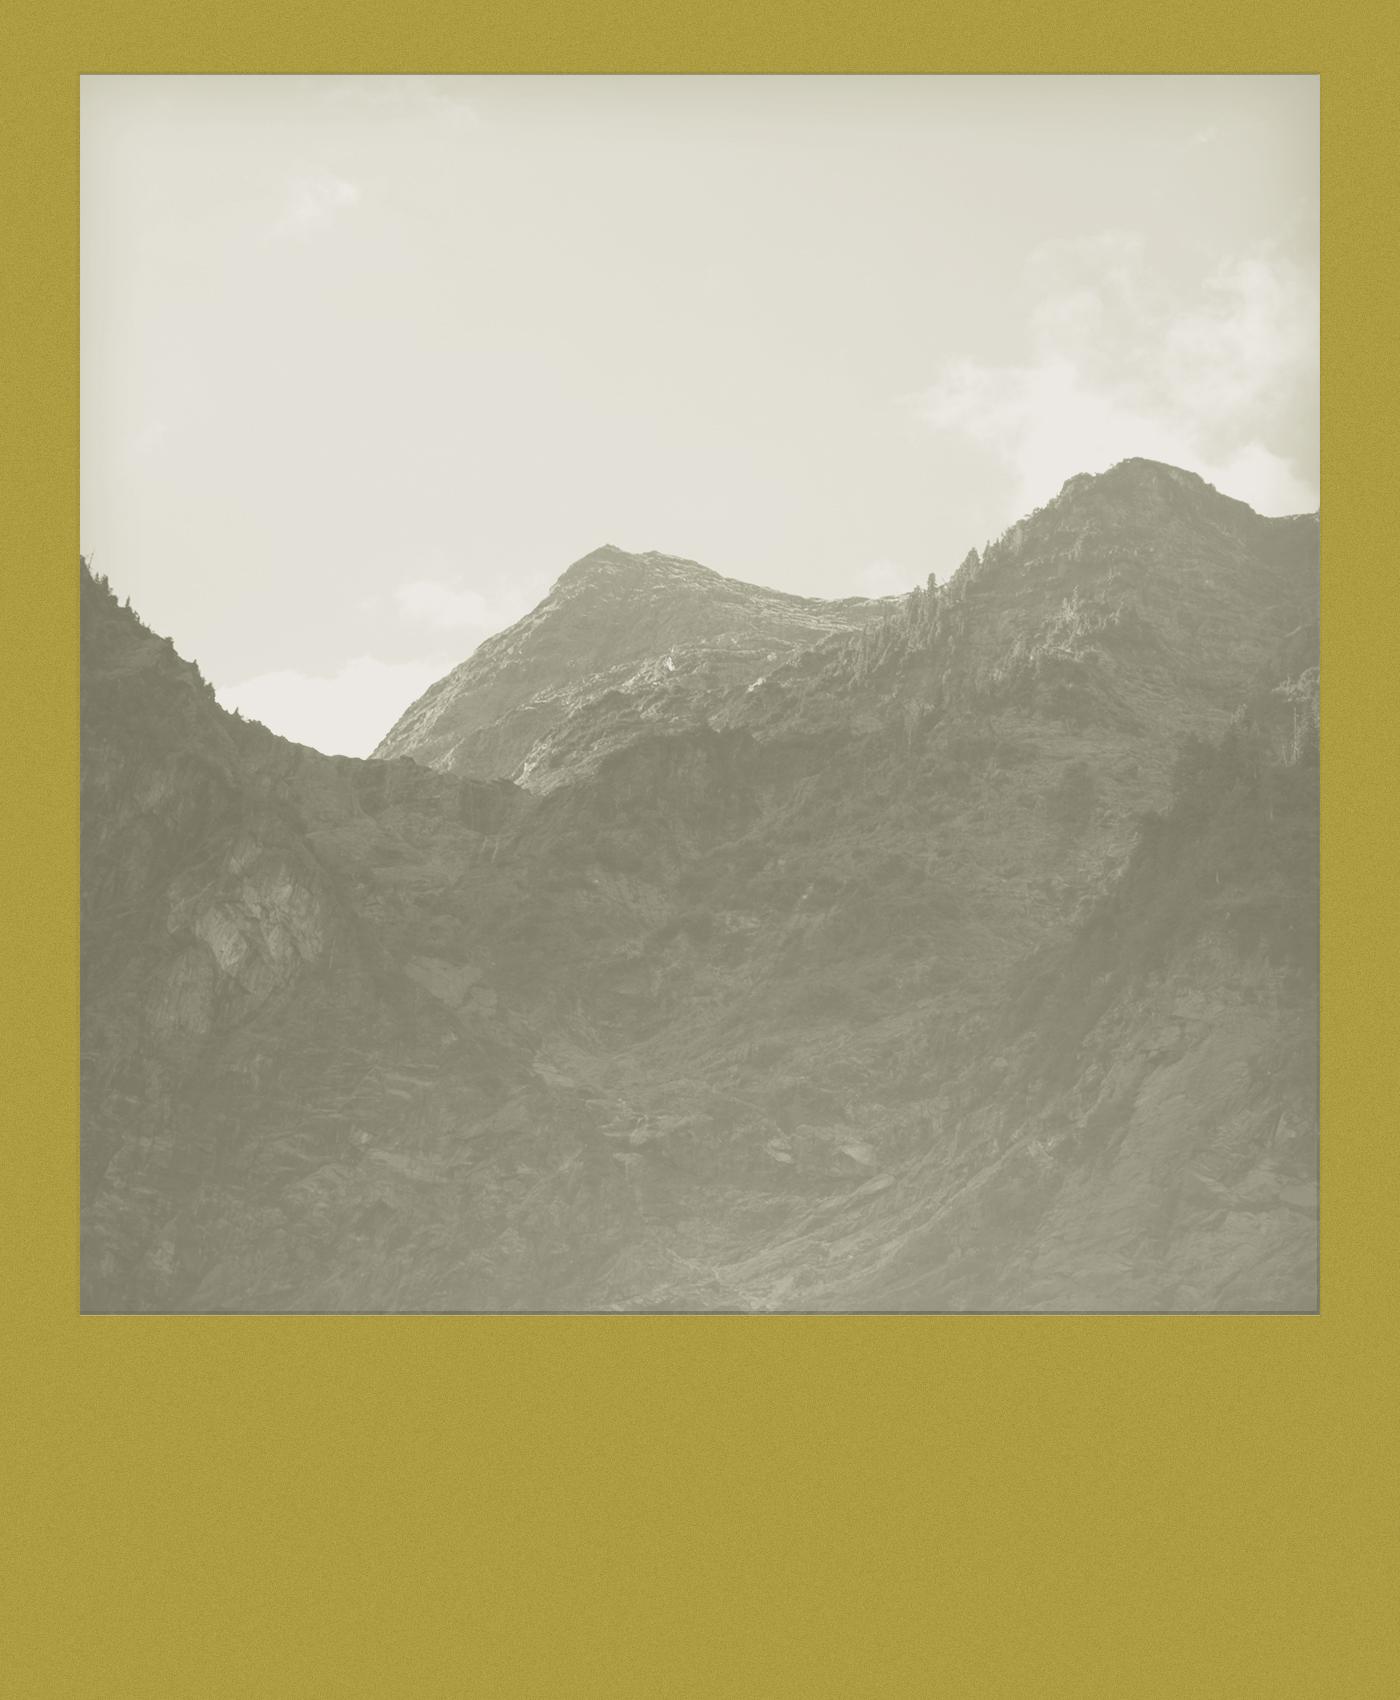 2 Polaroidification Photoshop Actions - Will Milne - FilterGrade